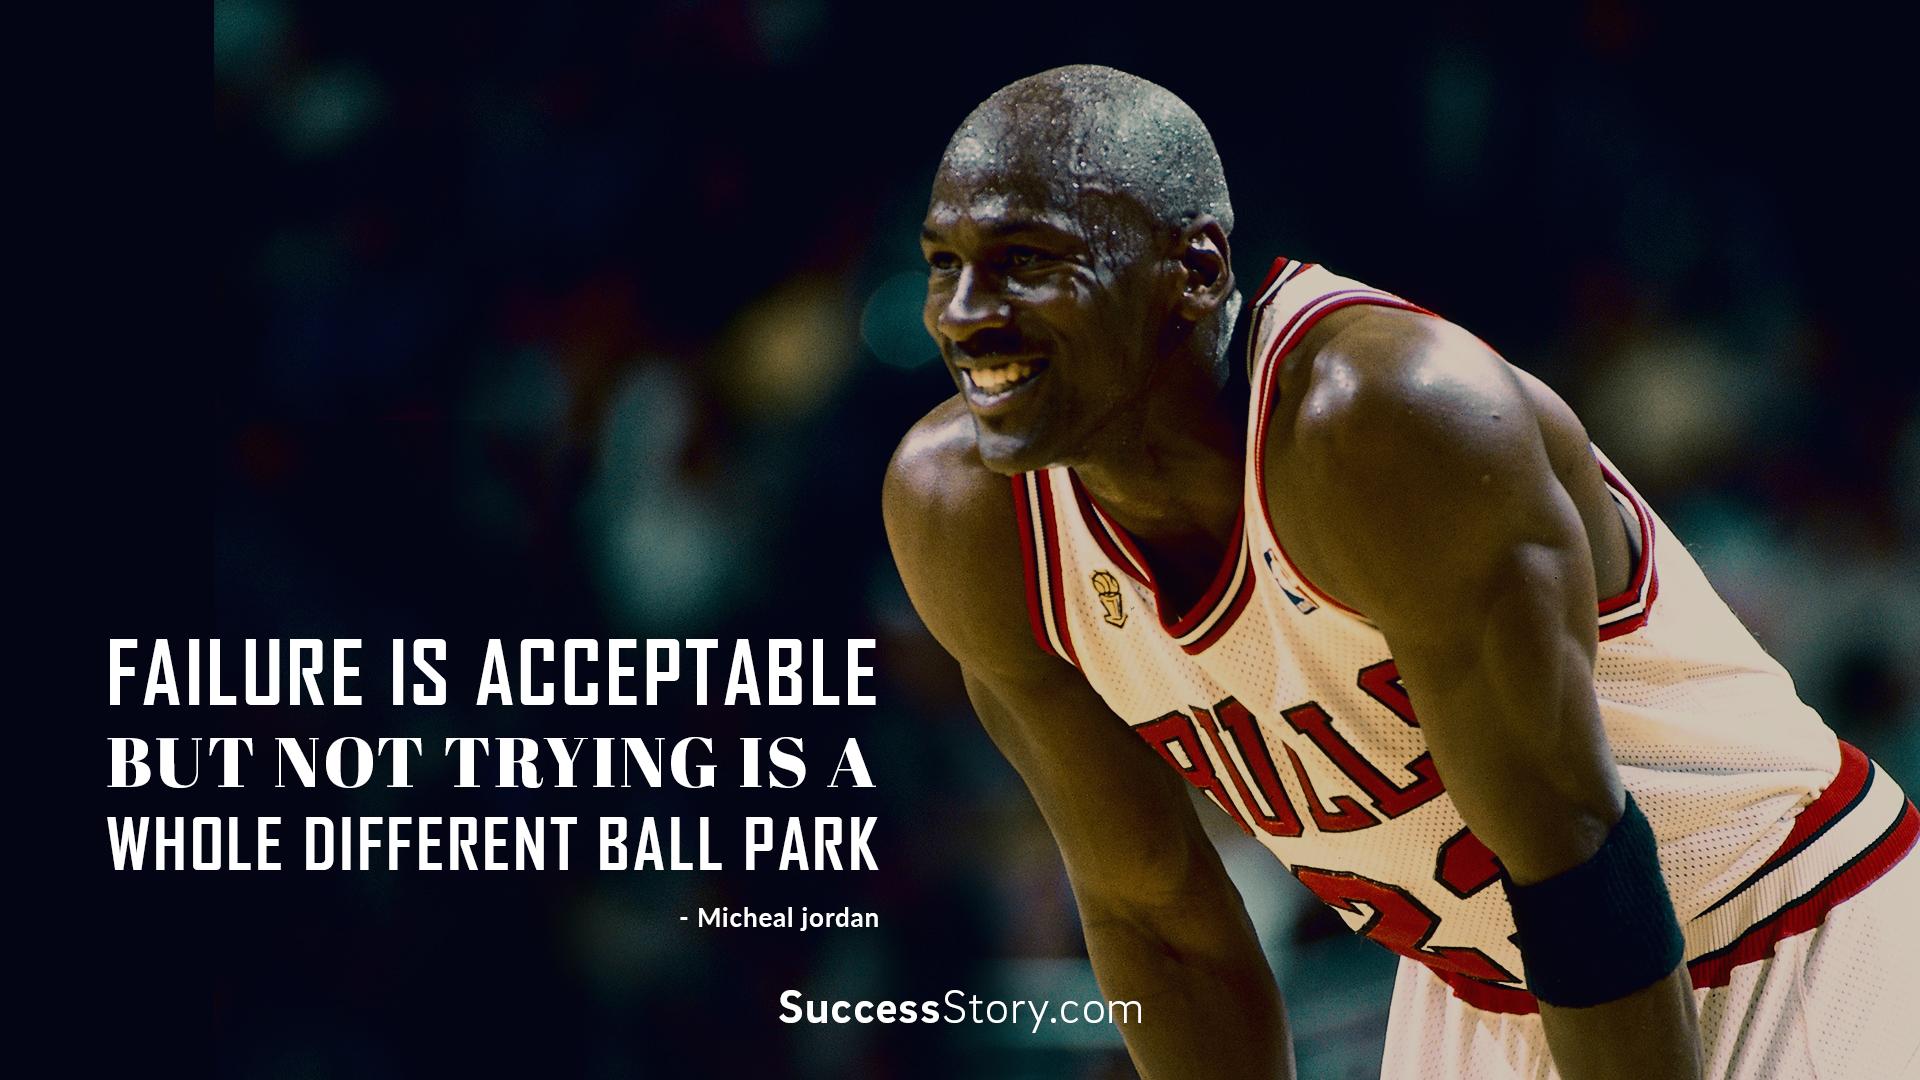 Failure is acceptable